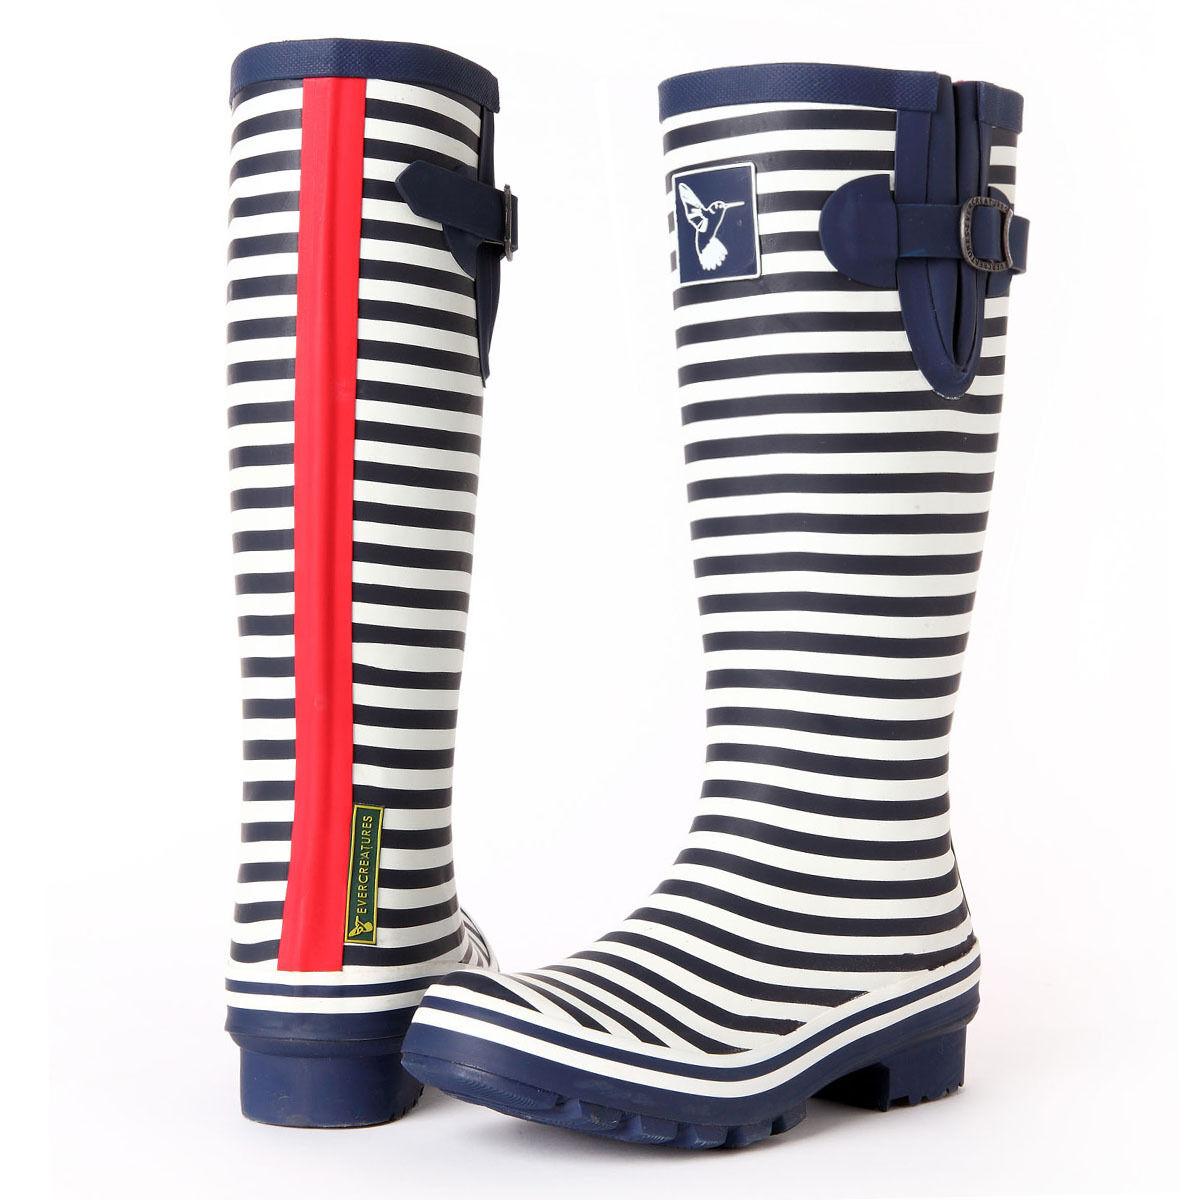 Evercreatures High Quality Fashion Stripe Rain Boot Gumboot Blue White Wellies